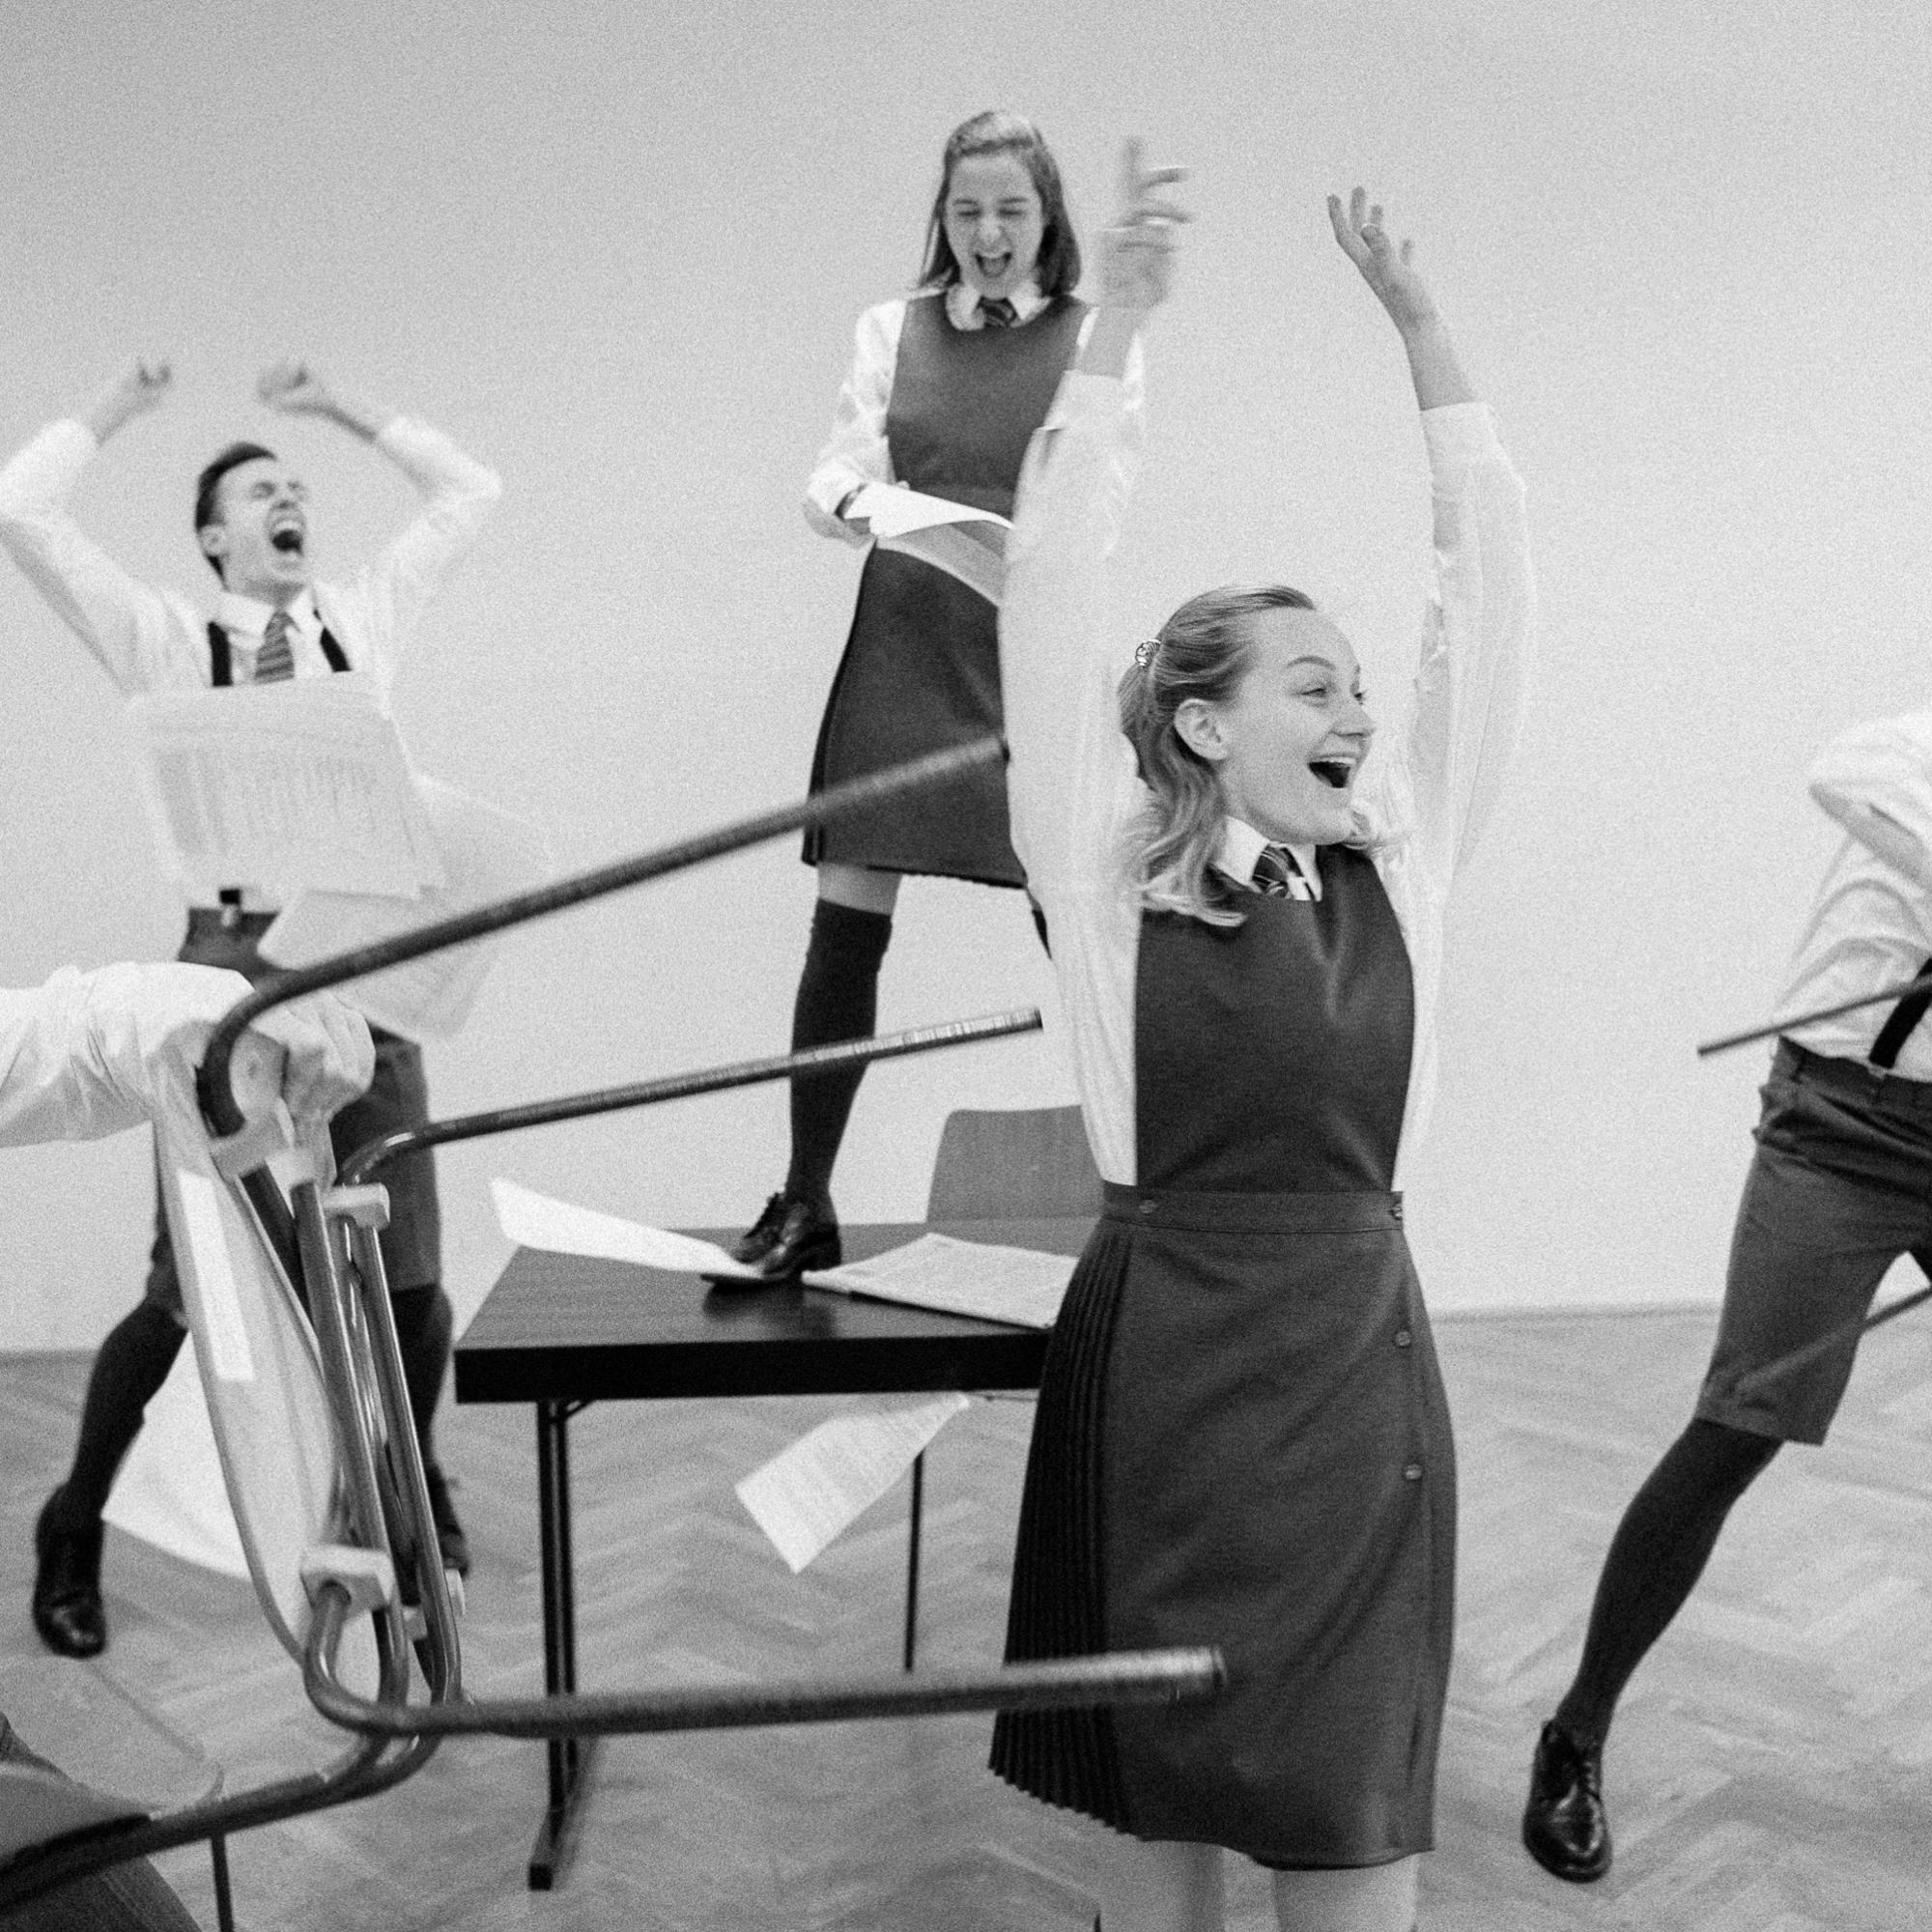 Anna Zöch bei Schüler Gerber Schulklasse rastet aus